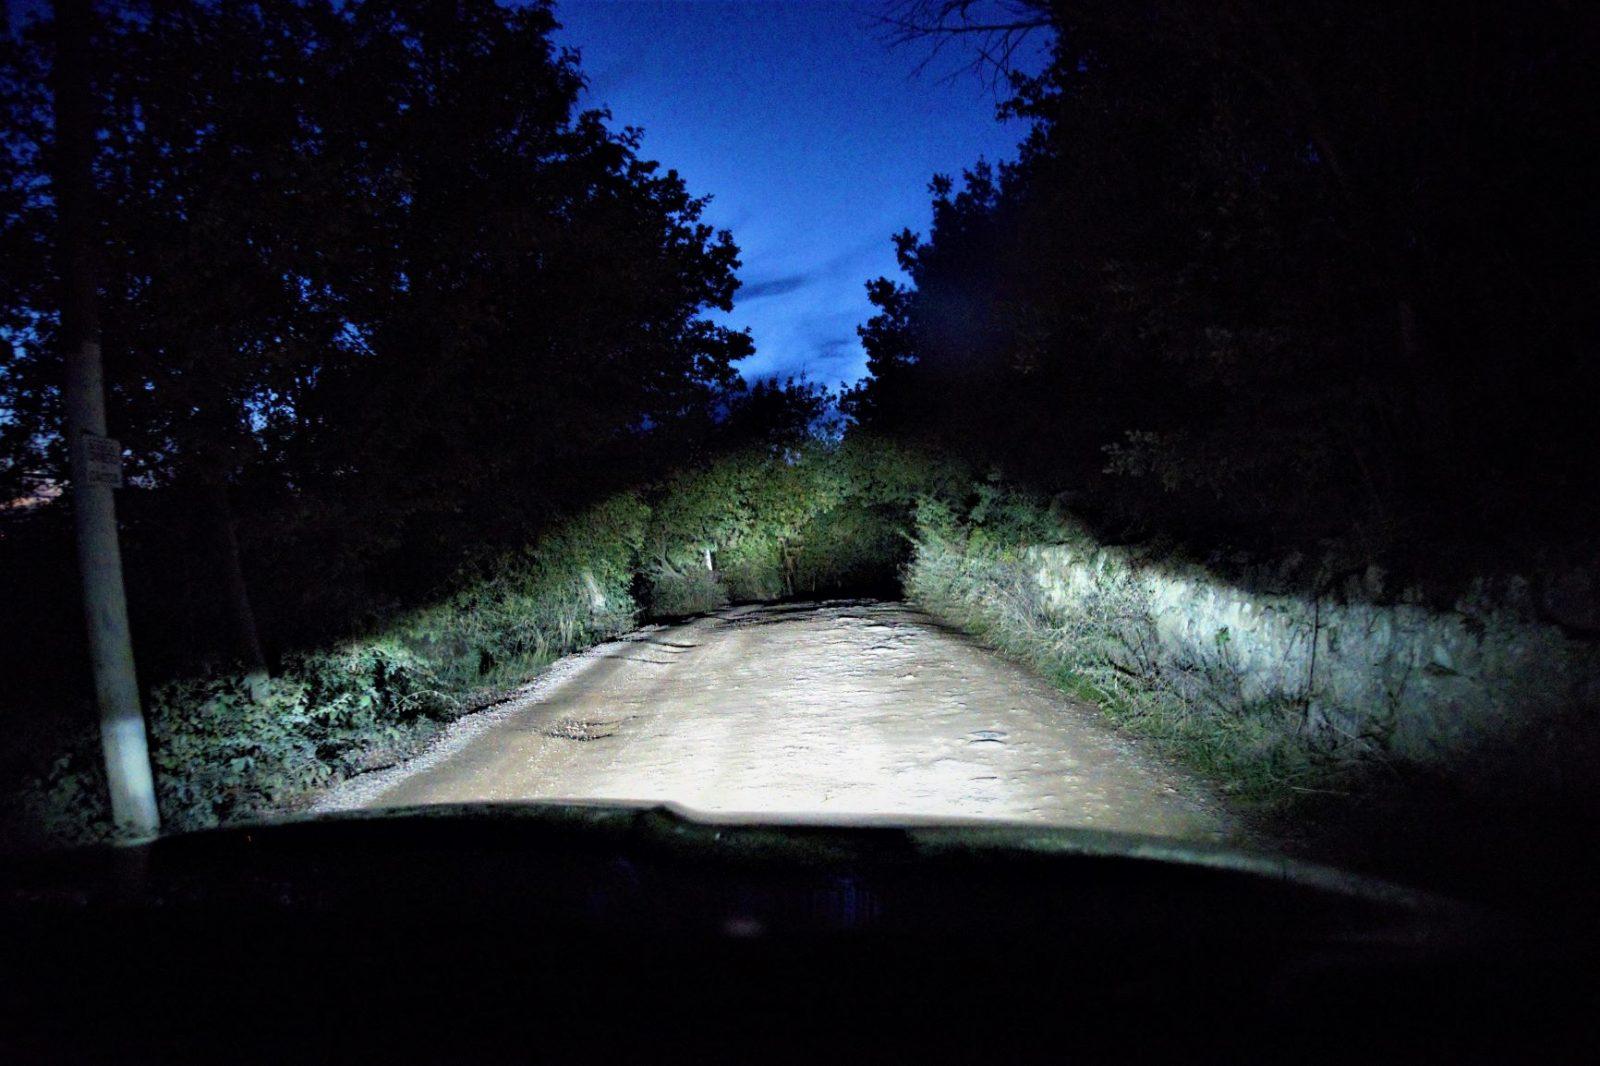 Toscana i mørket bilkjøring